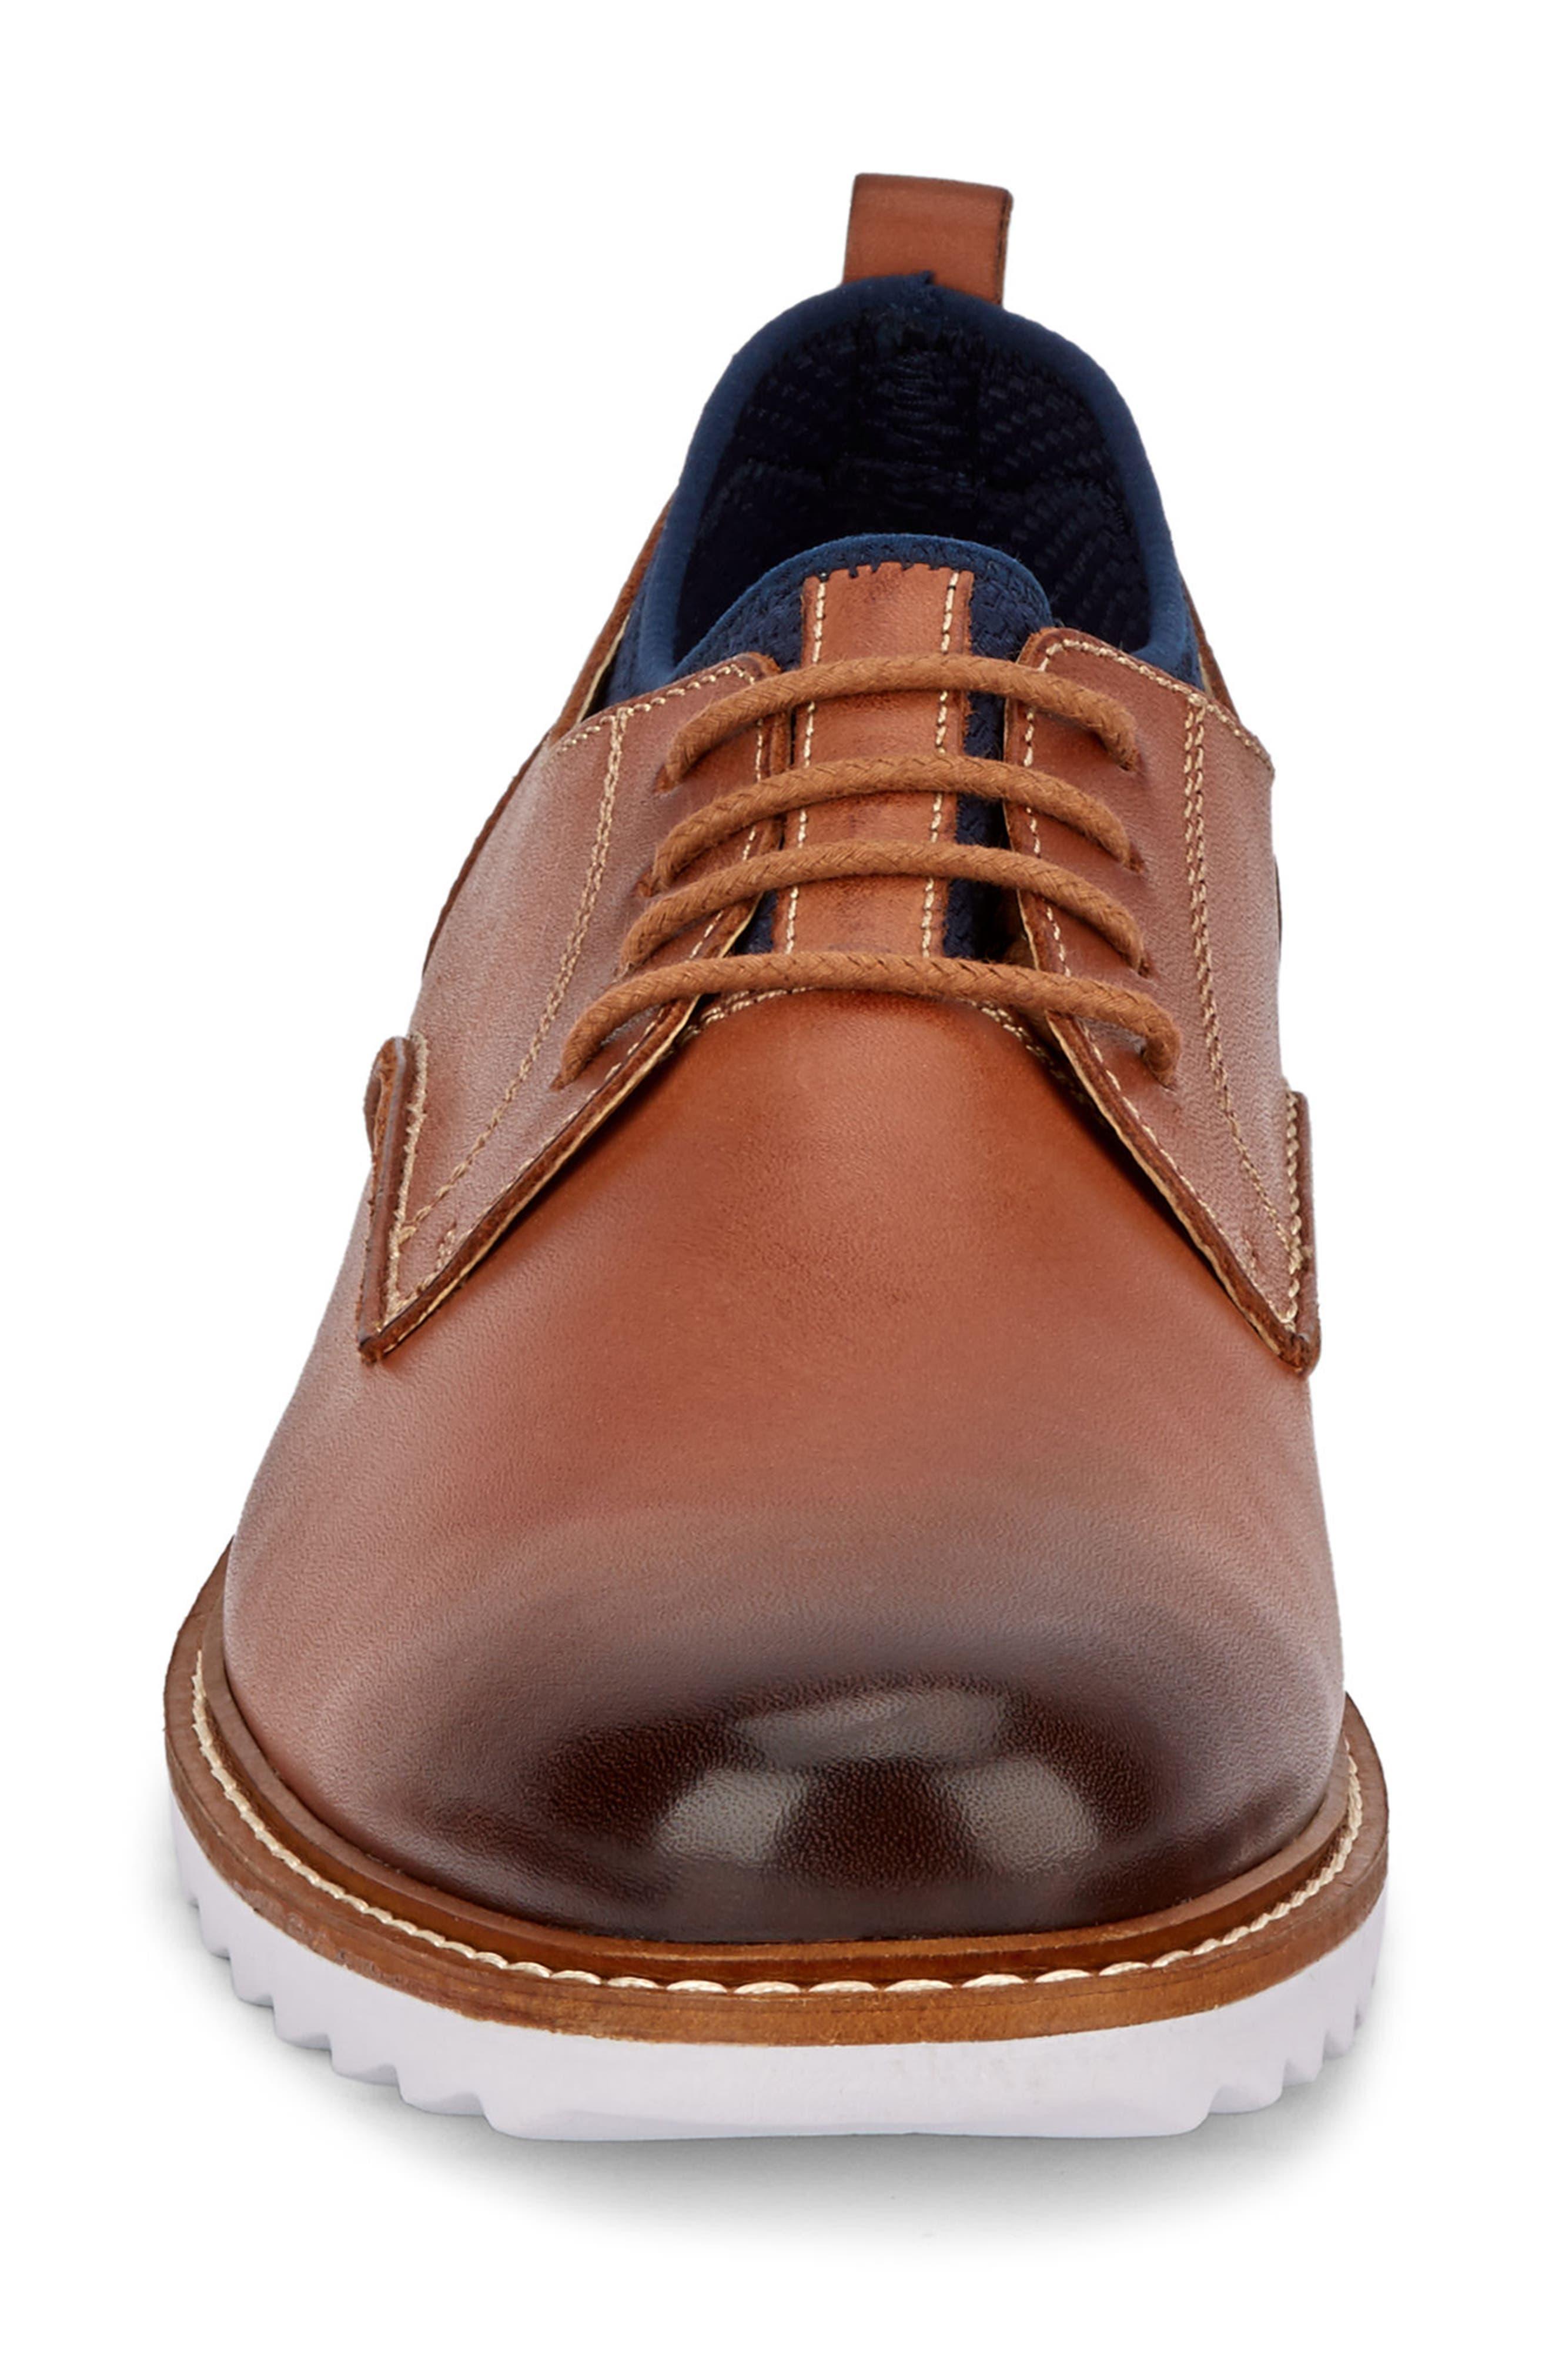 Buck 2.0 Plain Toe Derby,                             Alternate thumbnail 4, color,                             Tan Burnished Leather